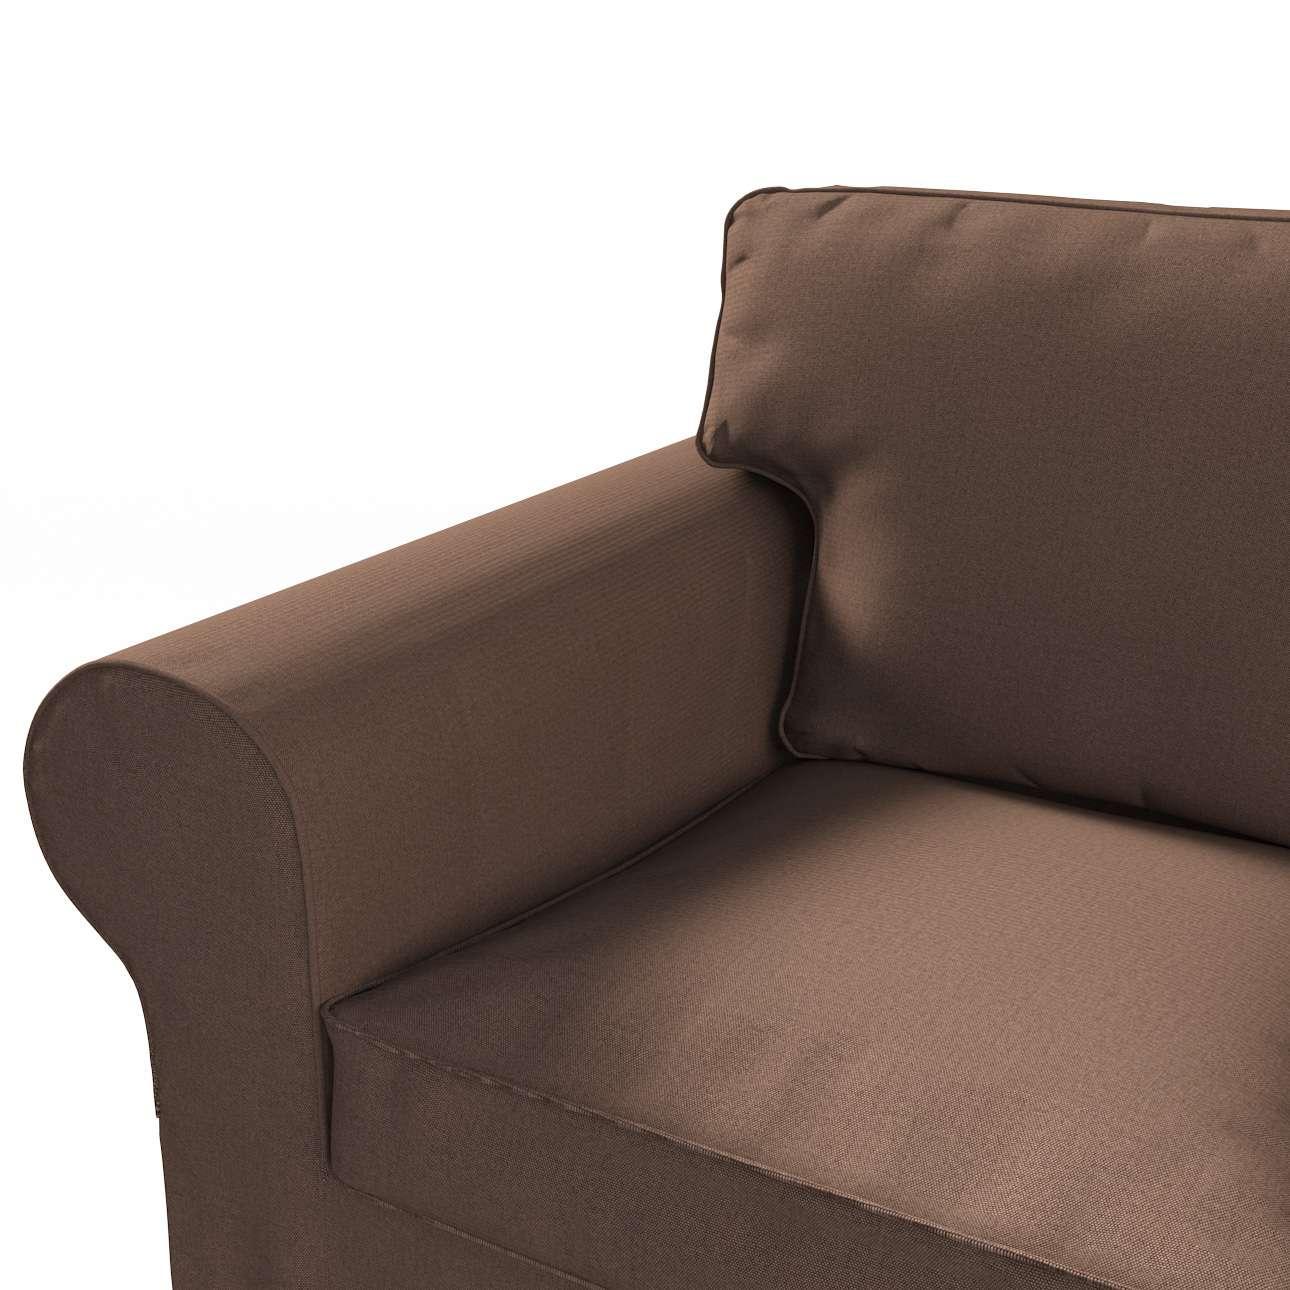 Ektorp 3-Sitzer Schlafsofabezug neues Modell (2013) Ektorp 3-Sitzer, ausklappbar, neues Modell ( 2013) von der Kollektion Etna, Stoff: 705-08